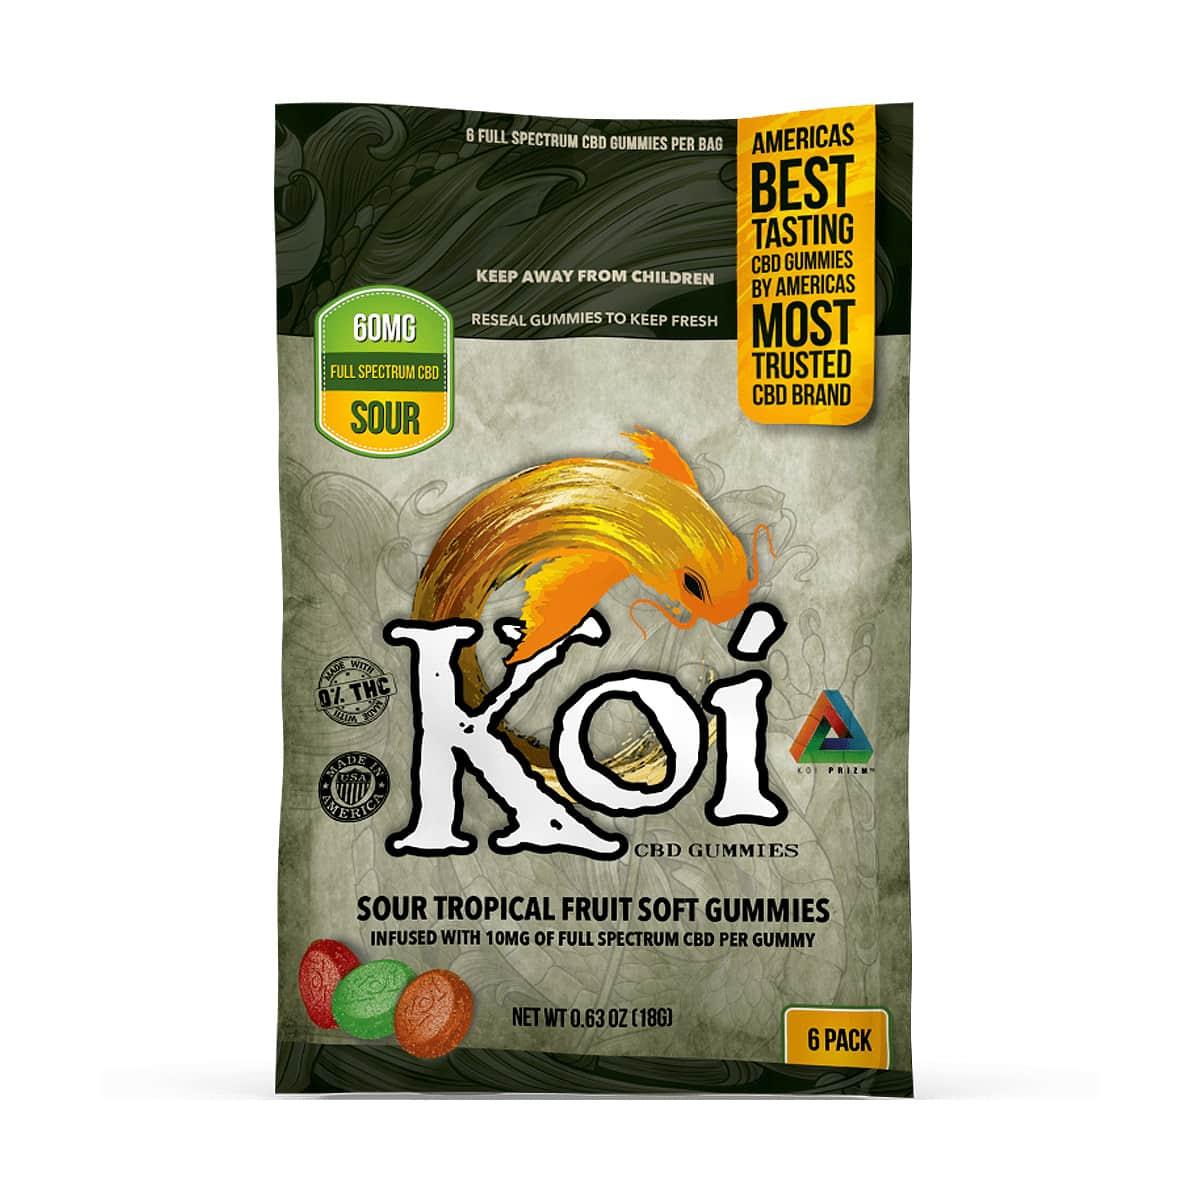 Koi CBD, CBD Gummies, Tropical Fruit, 6-count, 60mg of CBD